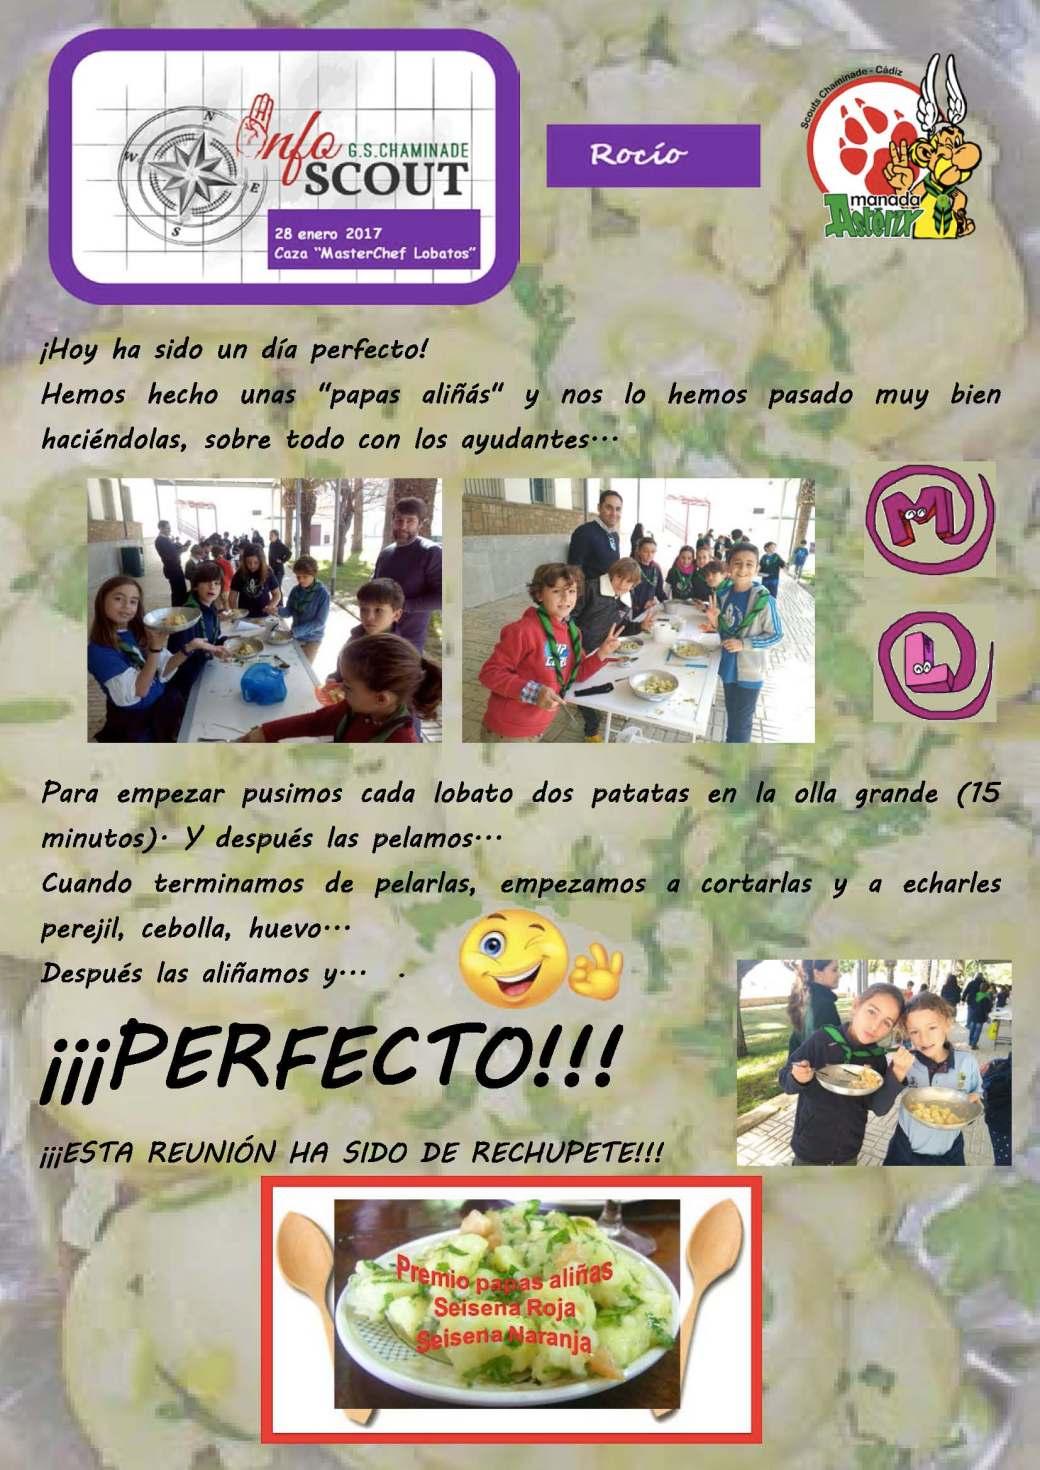 cronica-rocio-28-01-17